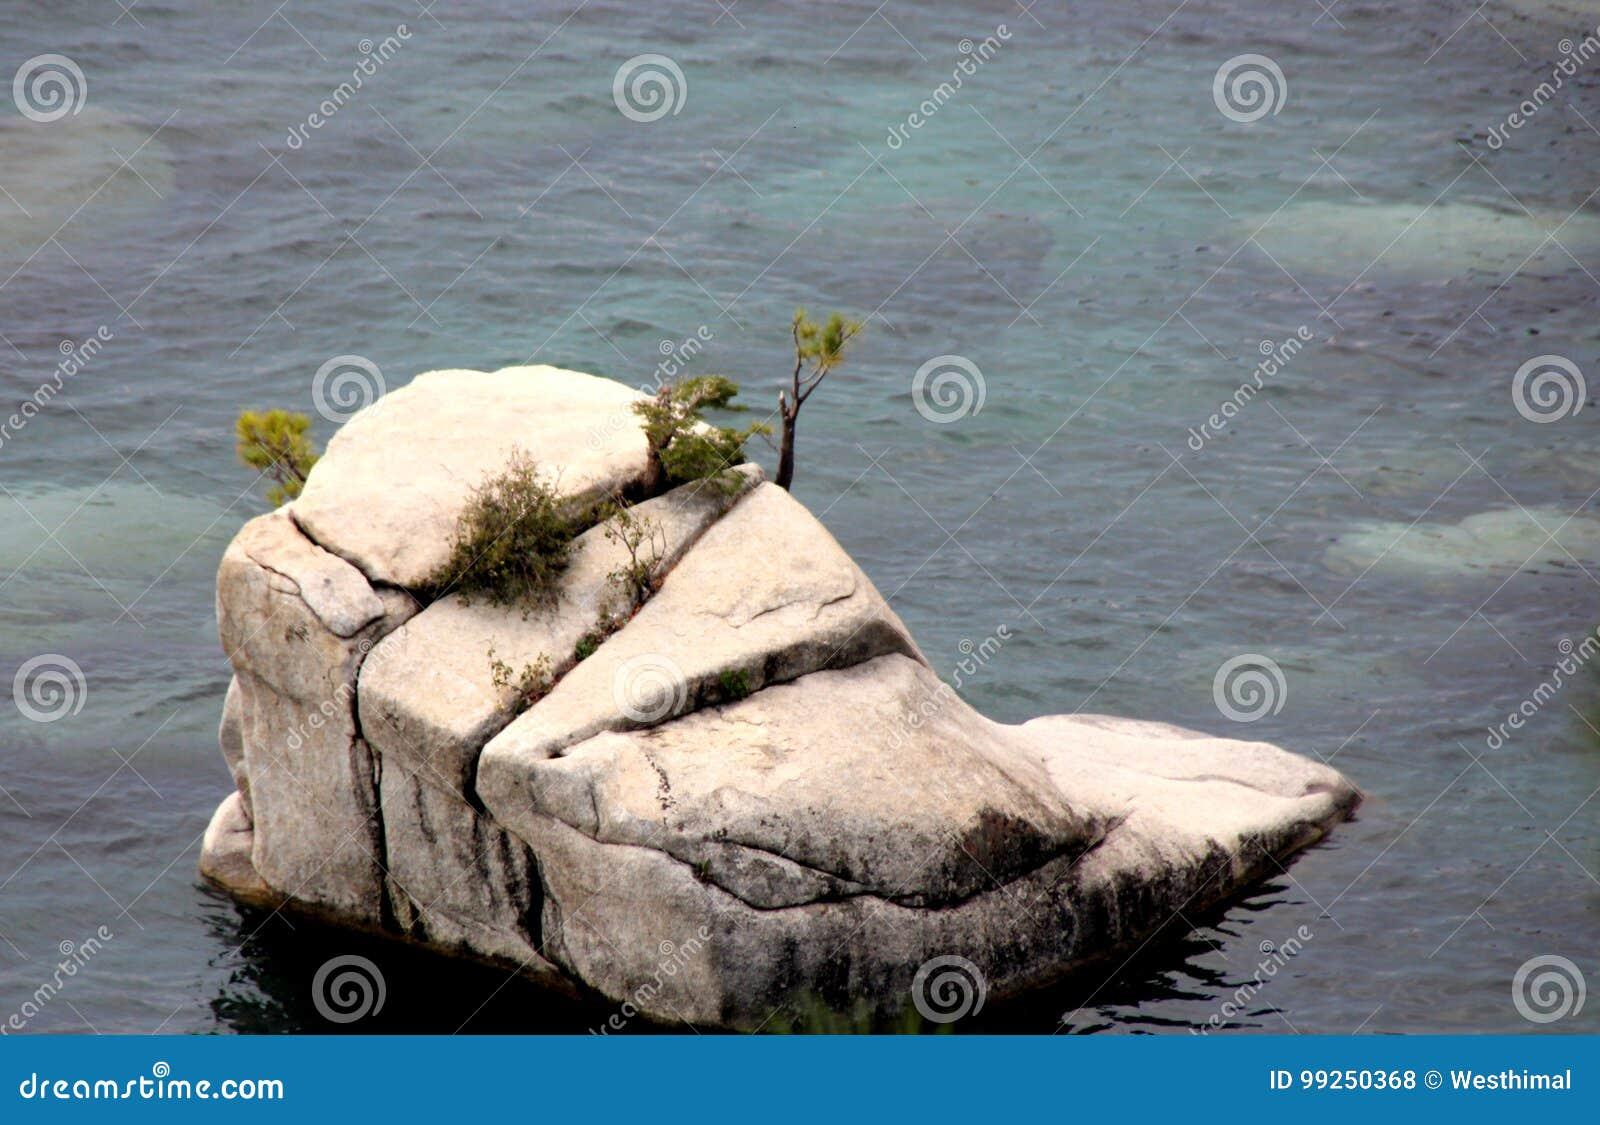 Bonsai rock, Tahoe lake, Nevada side, USA